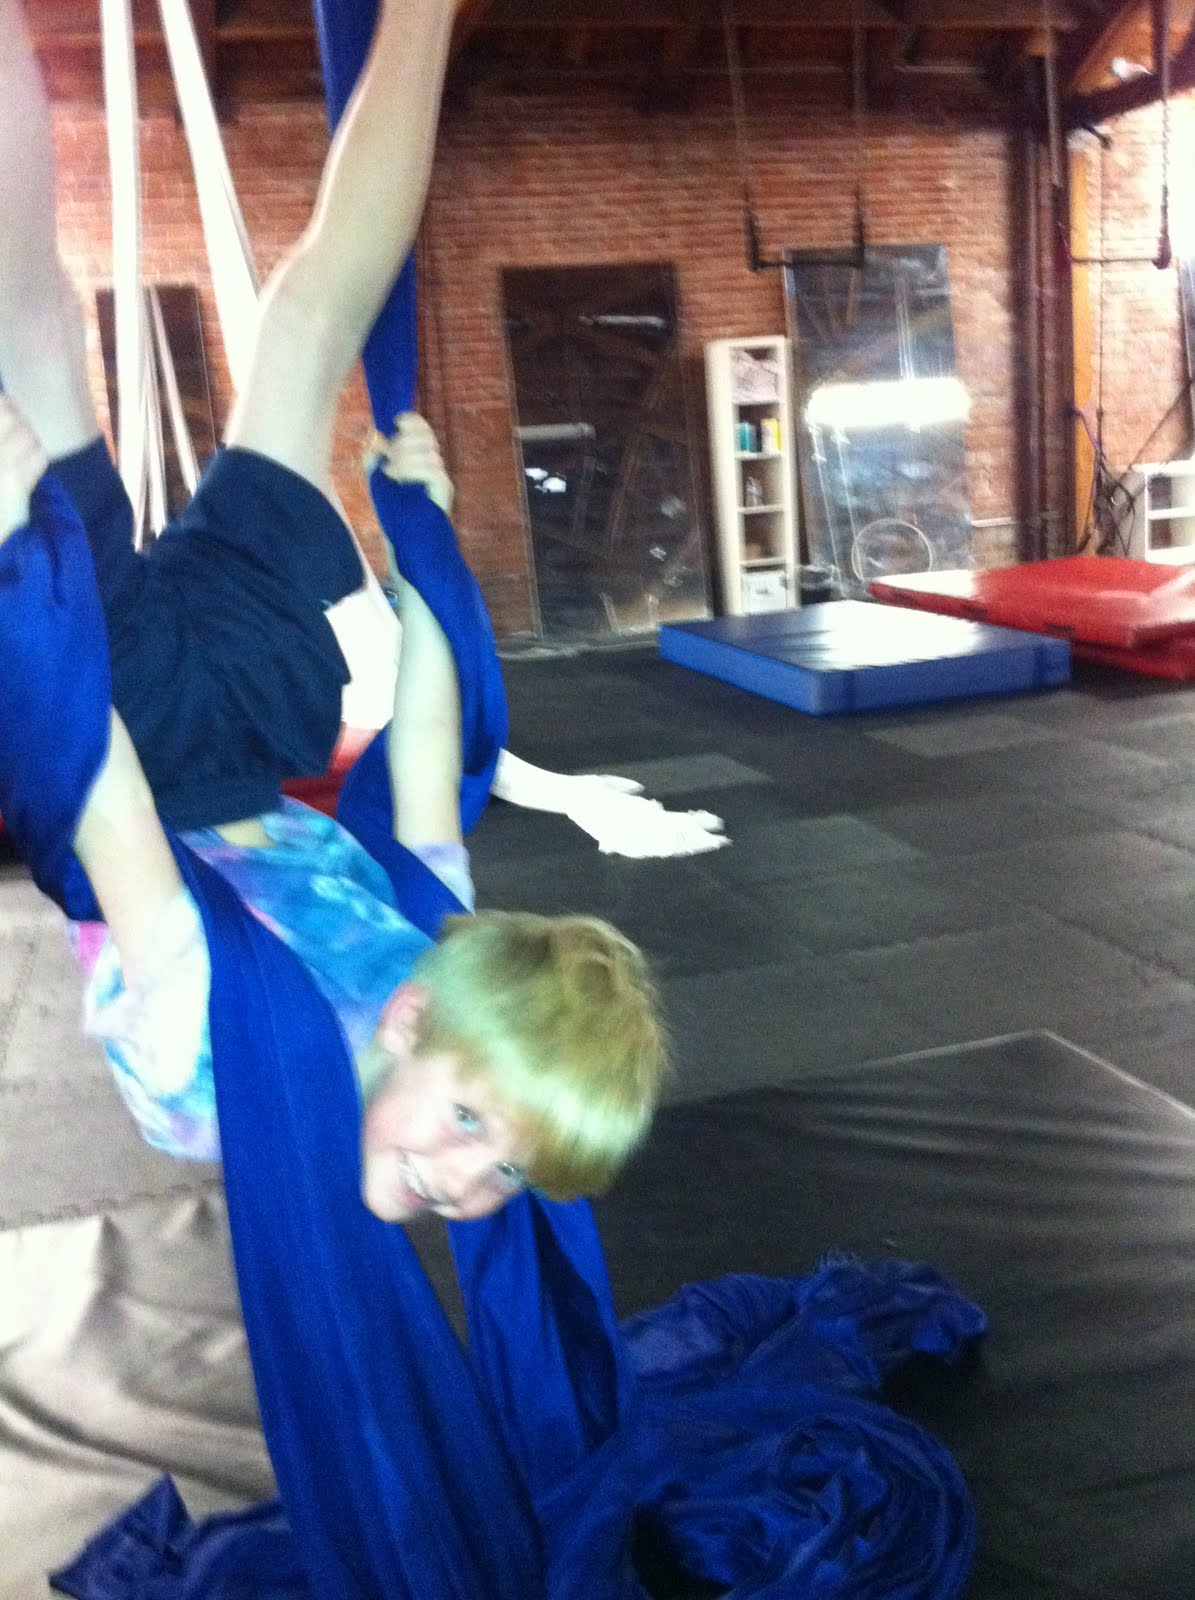 Tied Upside Down